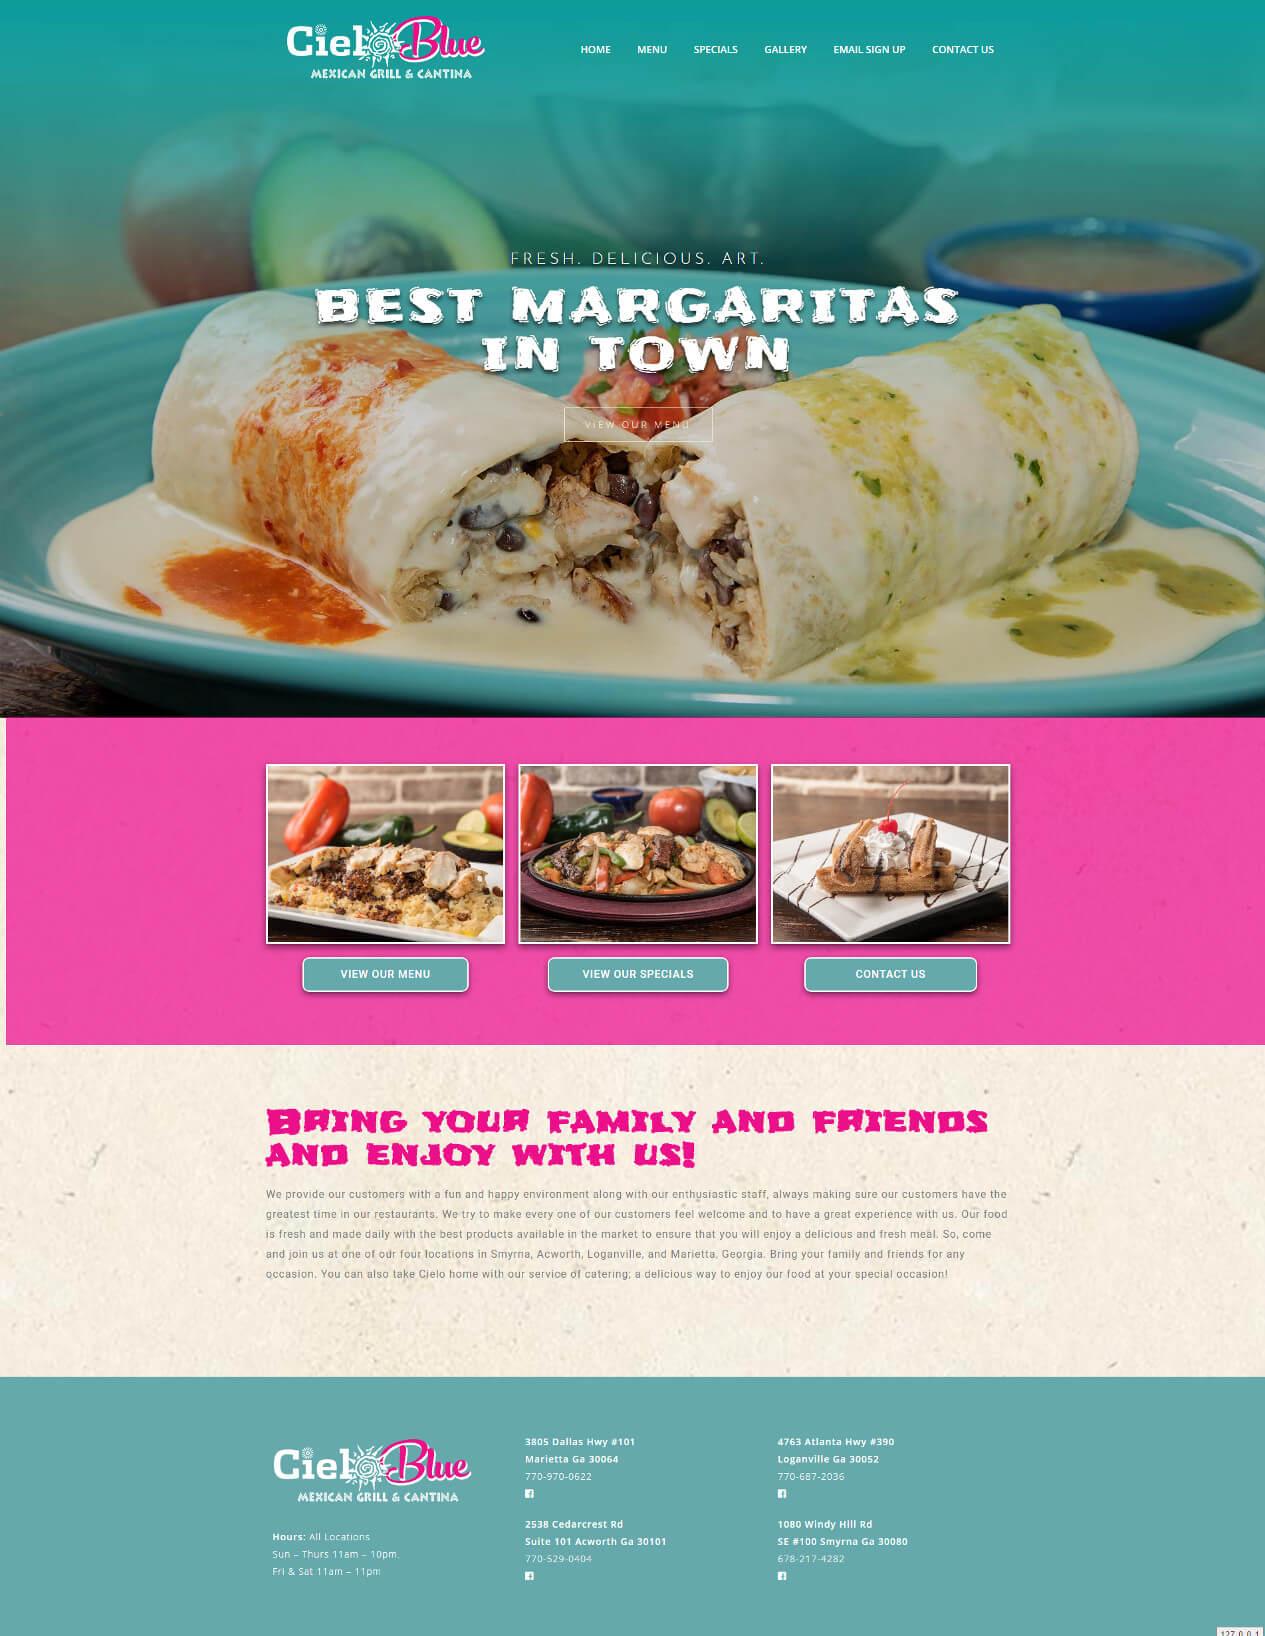 Cielo Blue Cantina - TLS Mobile Friendly Website